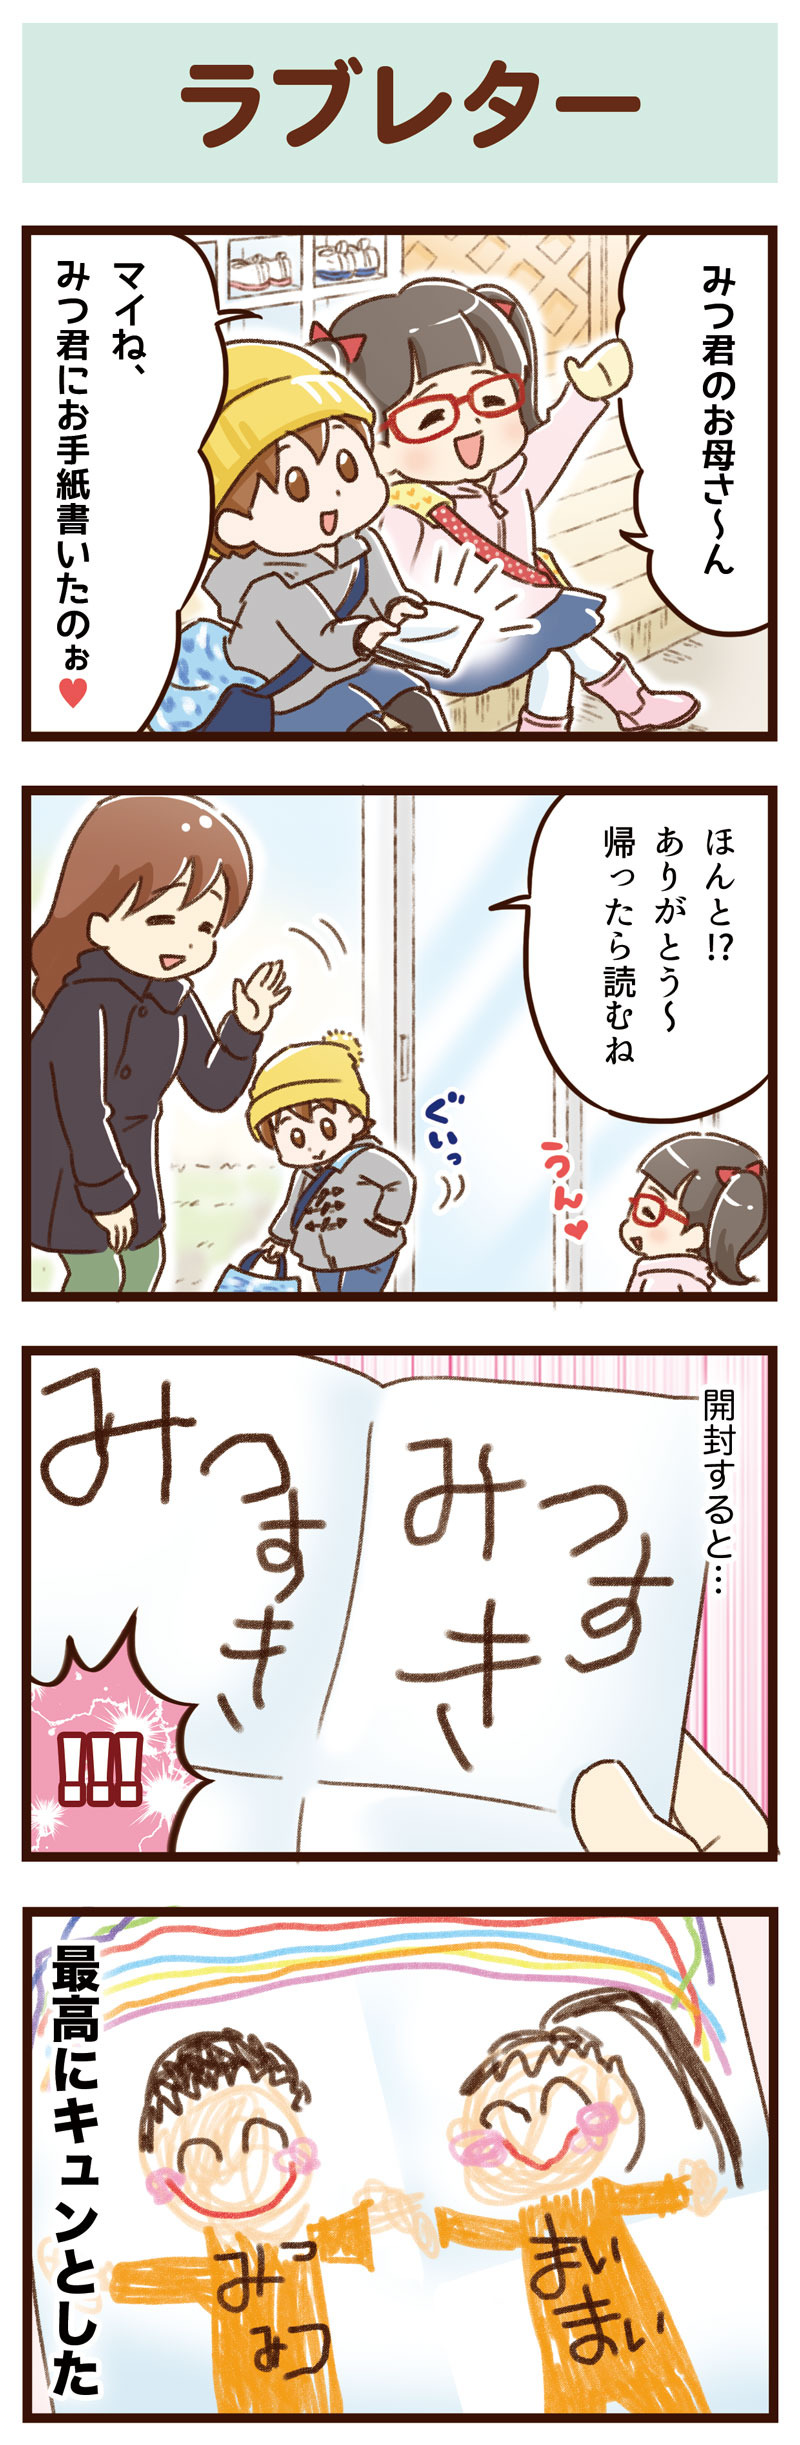 yumui244-1